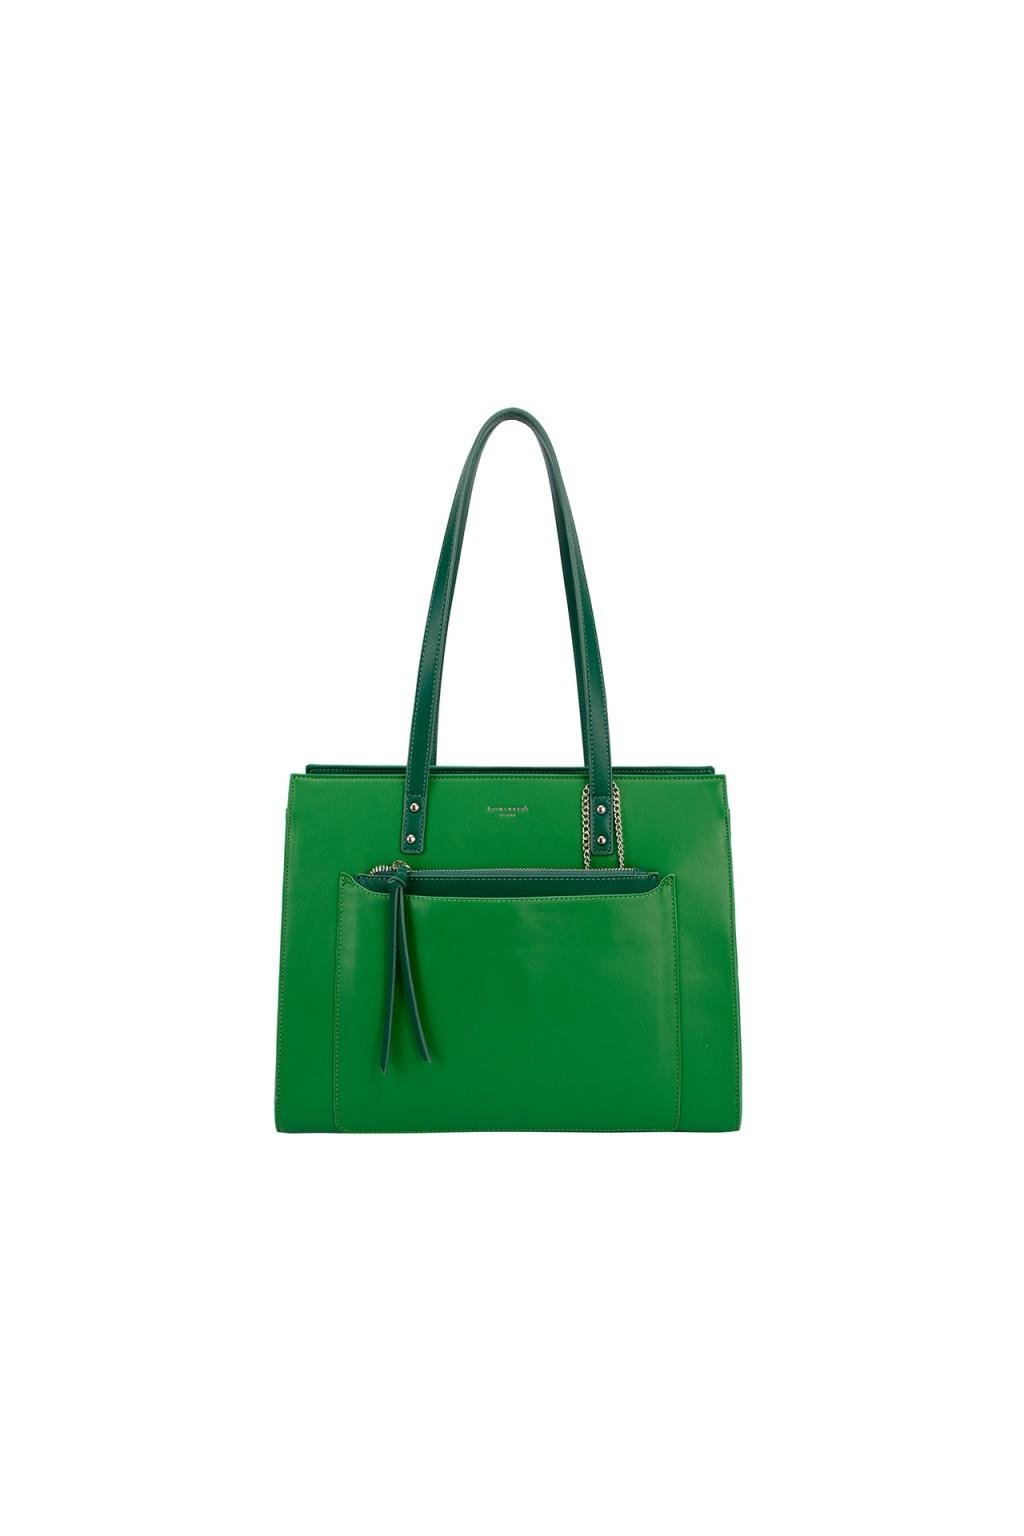 kabelka david jones trendy zelená ALAN